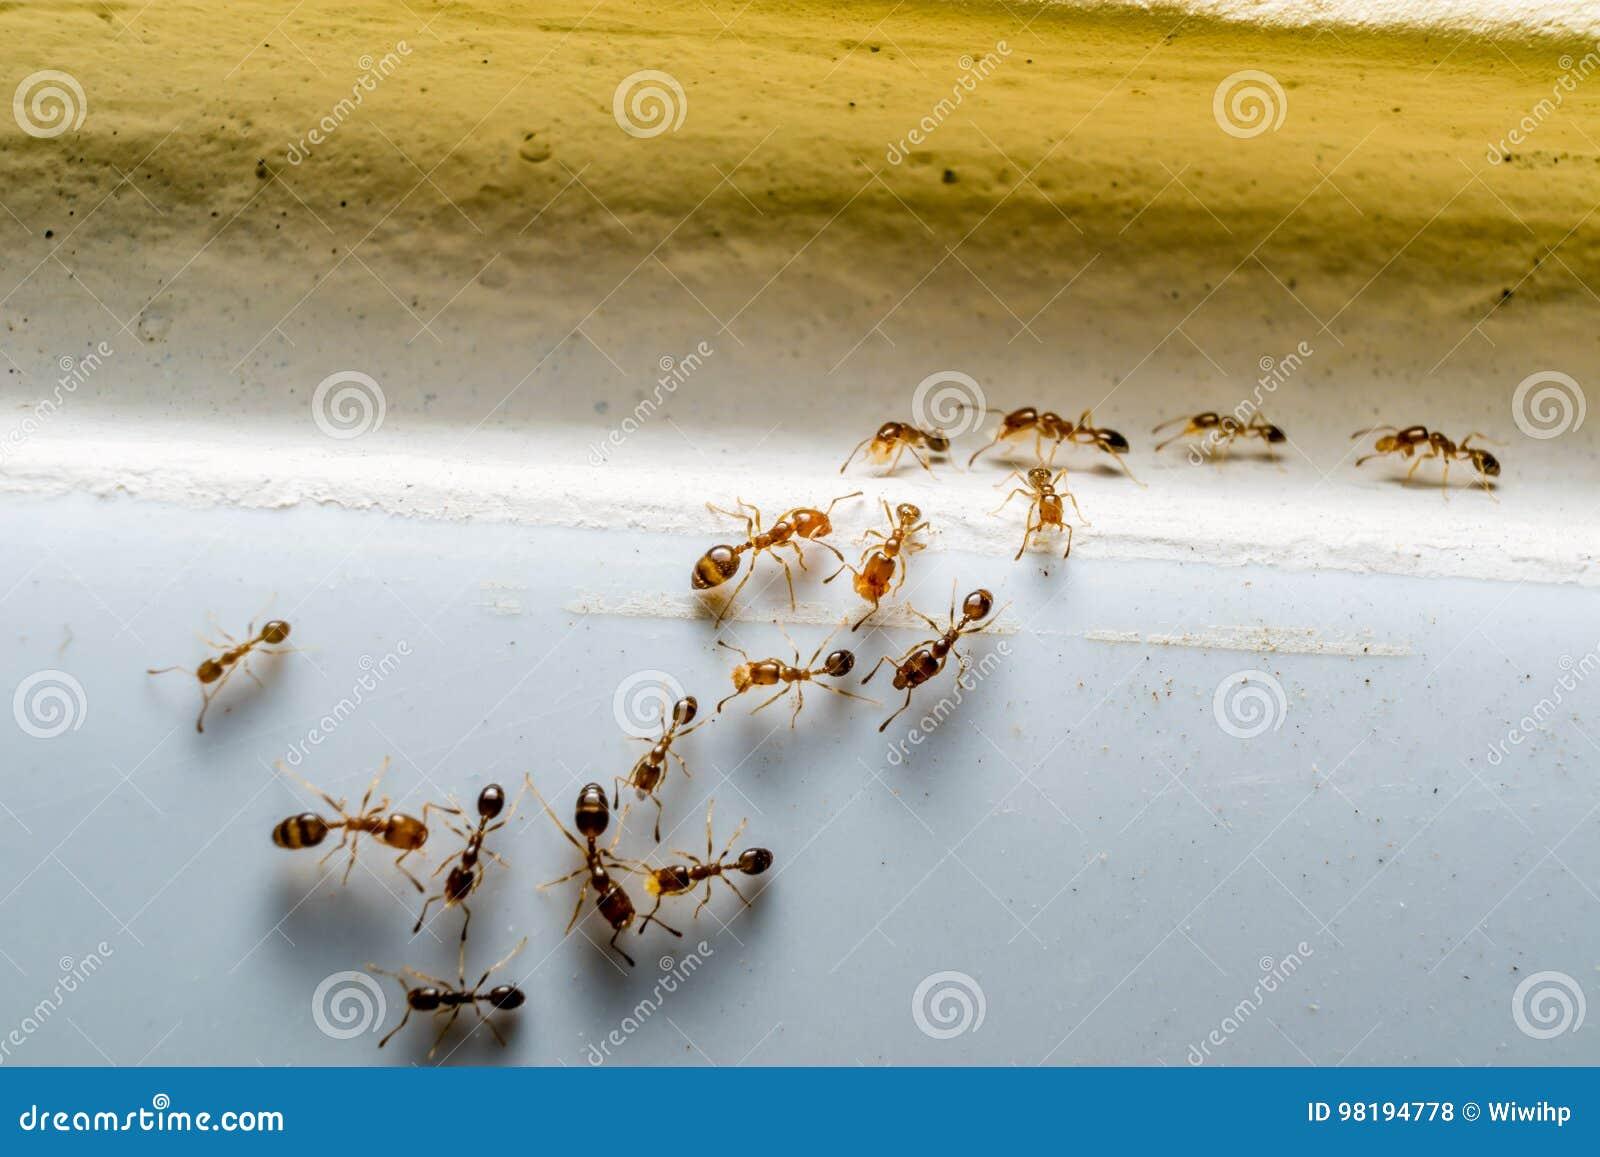 Ameisen in buntem